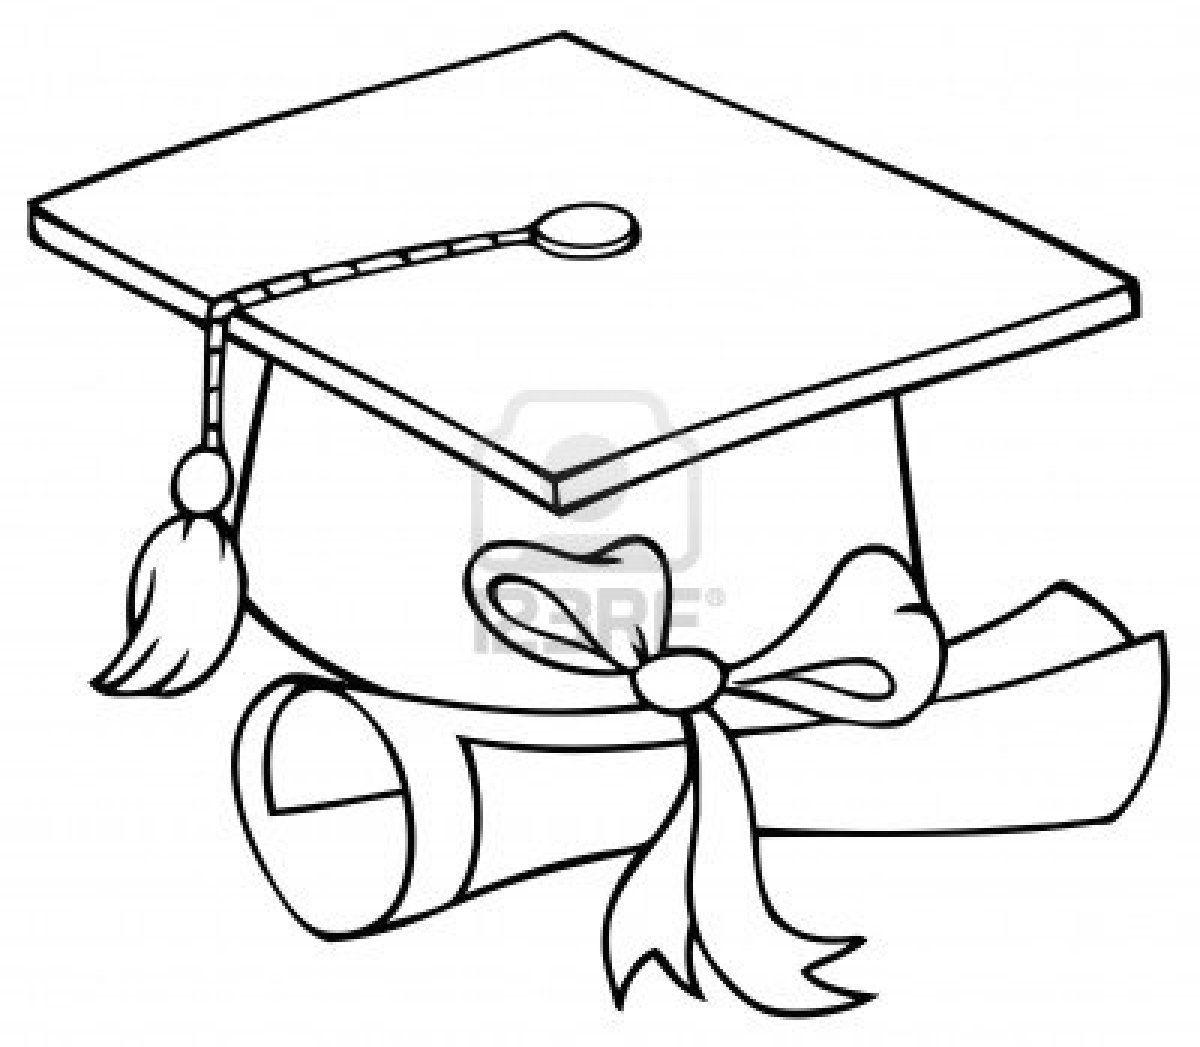 1200x1047 Graduation Cap Coloring Page Graduation Cap Coloring Page